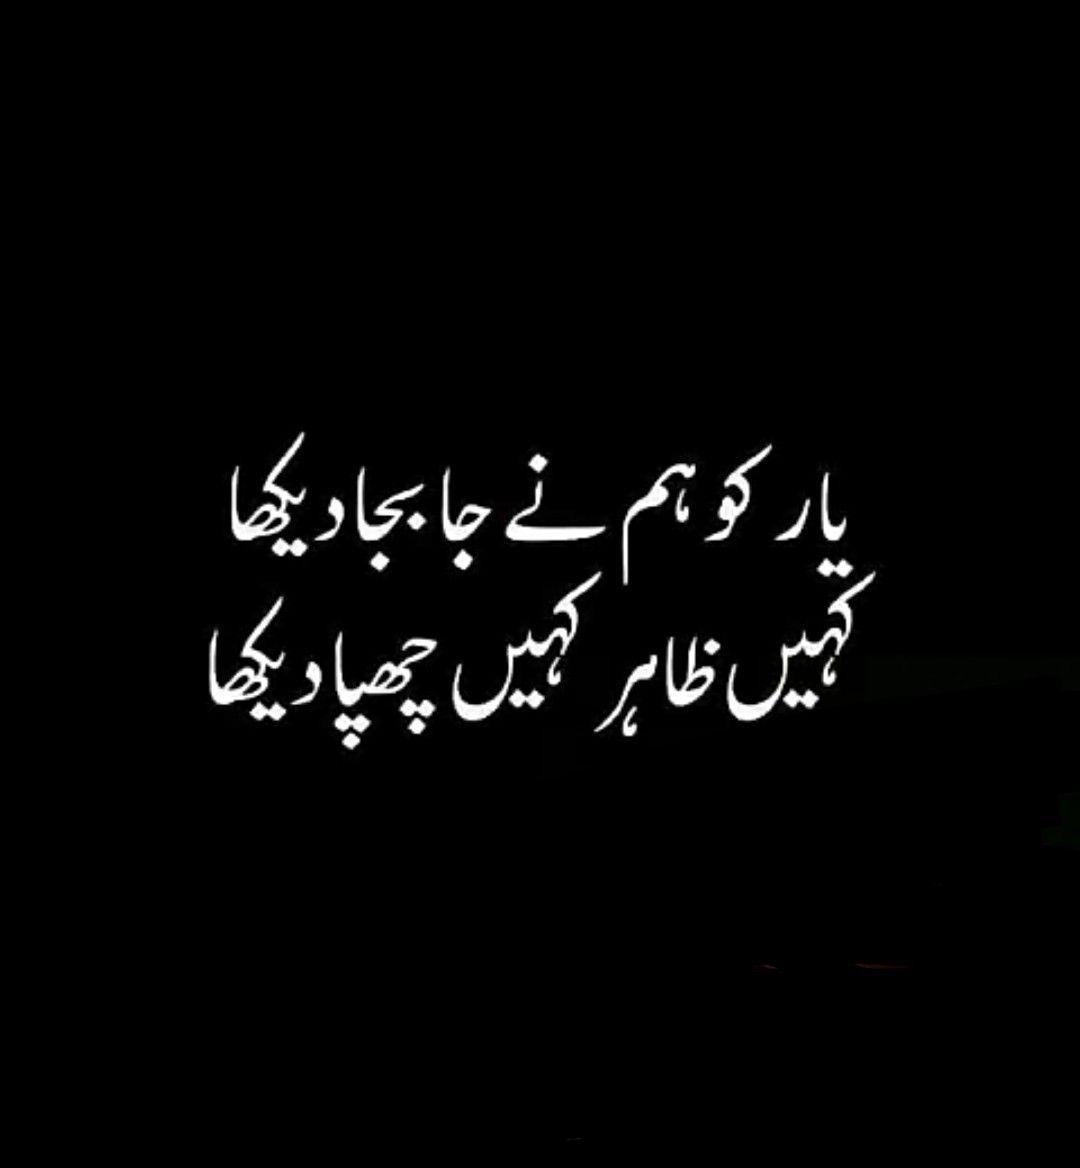 Yaar Ko Hum Ne Jabaja Dekha Jokes Quotes Deep Words Punjabi Poetry